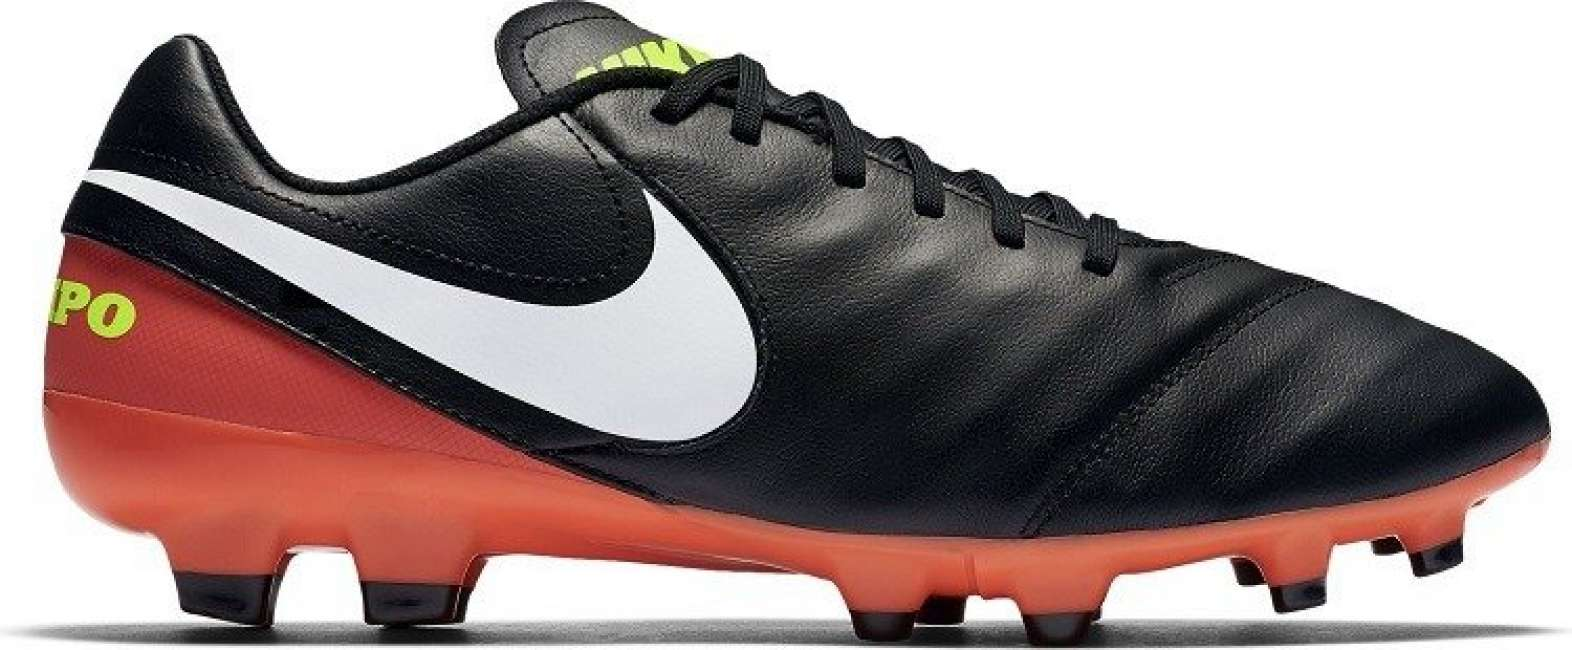 Priser på Nike Tiempo Genio II Leather FG Fodboldstøvler Herre